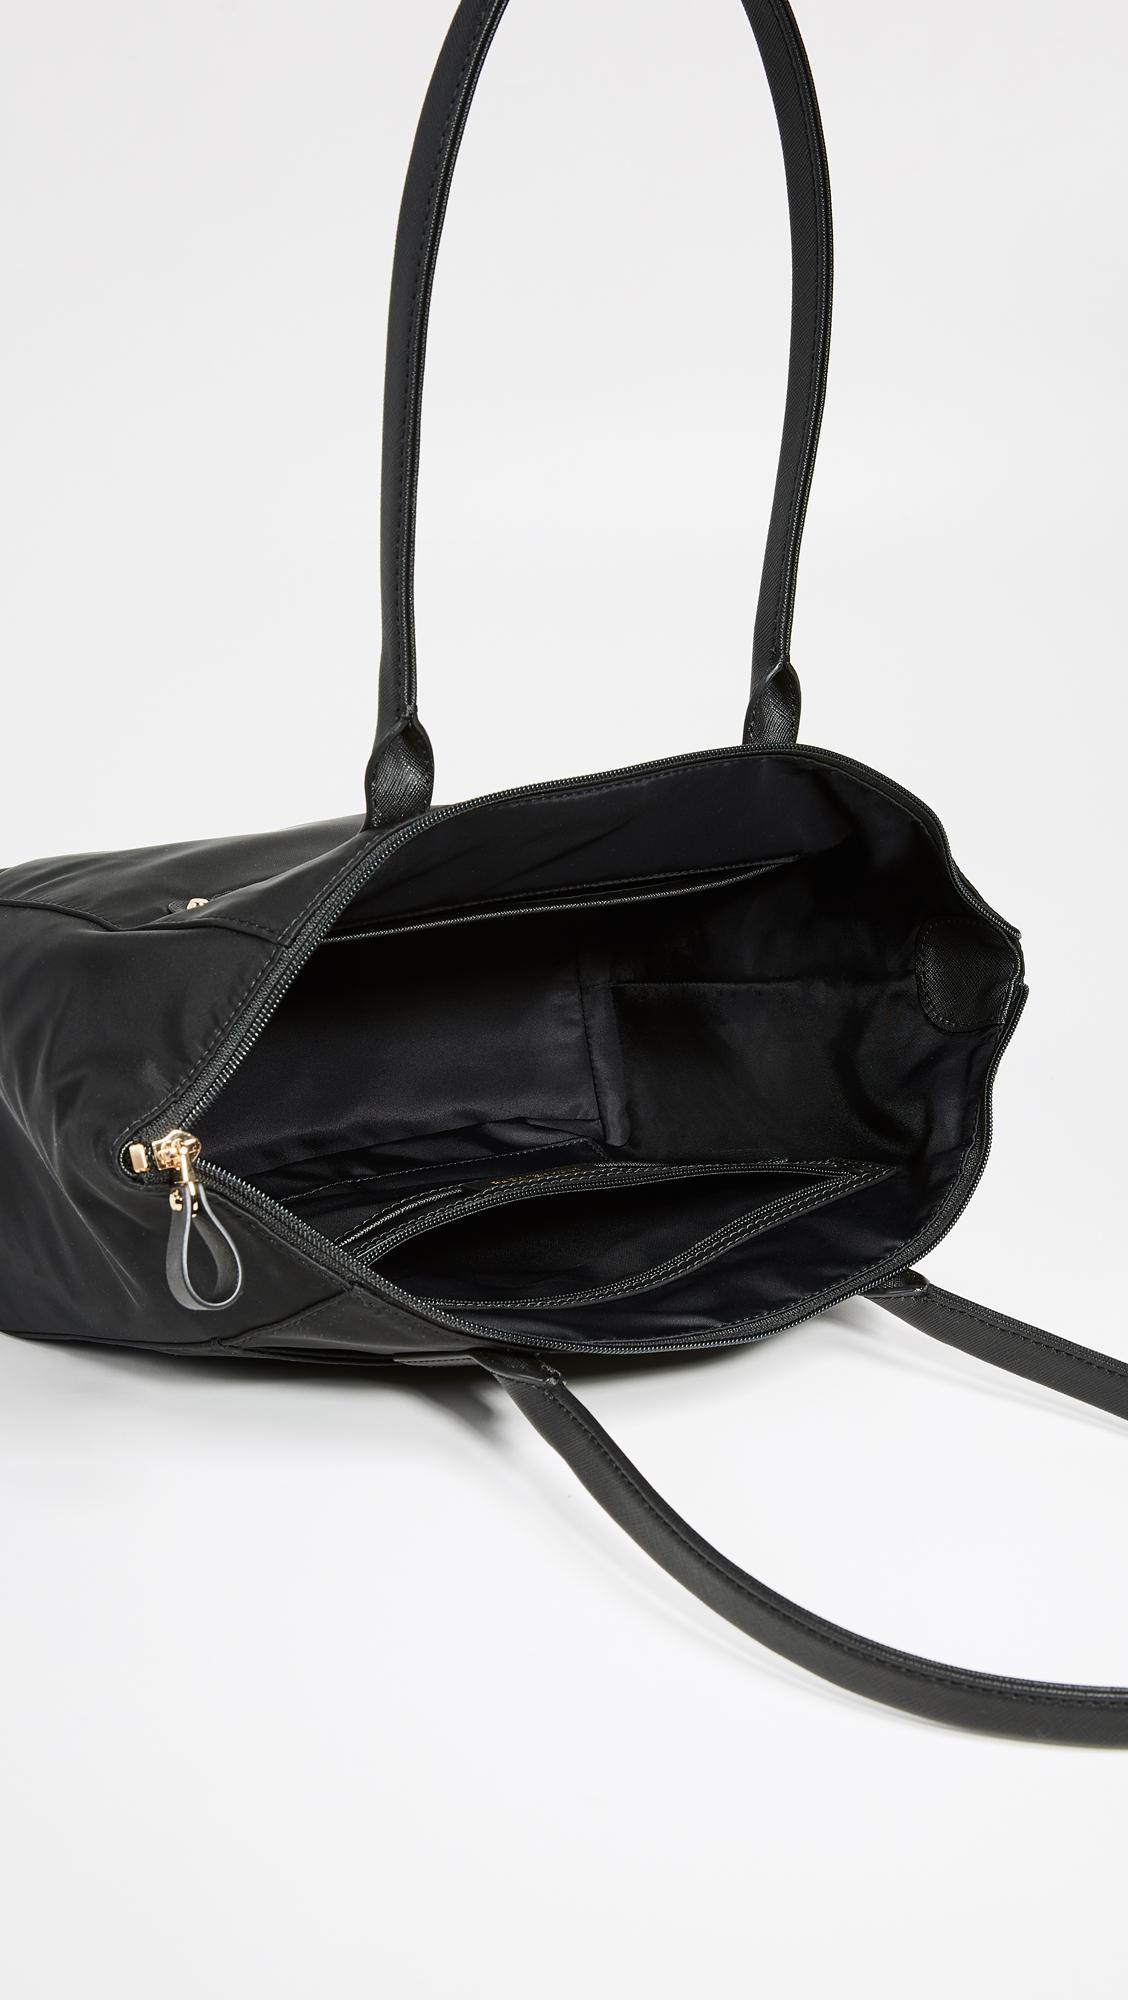 MICHAEL Michael Kors Synthetic Nylon Kelsey Medium Top Zip Tote in Black/Gold (Black)